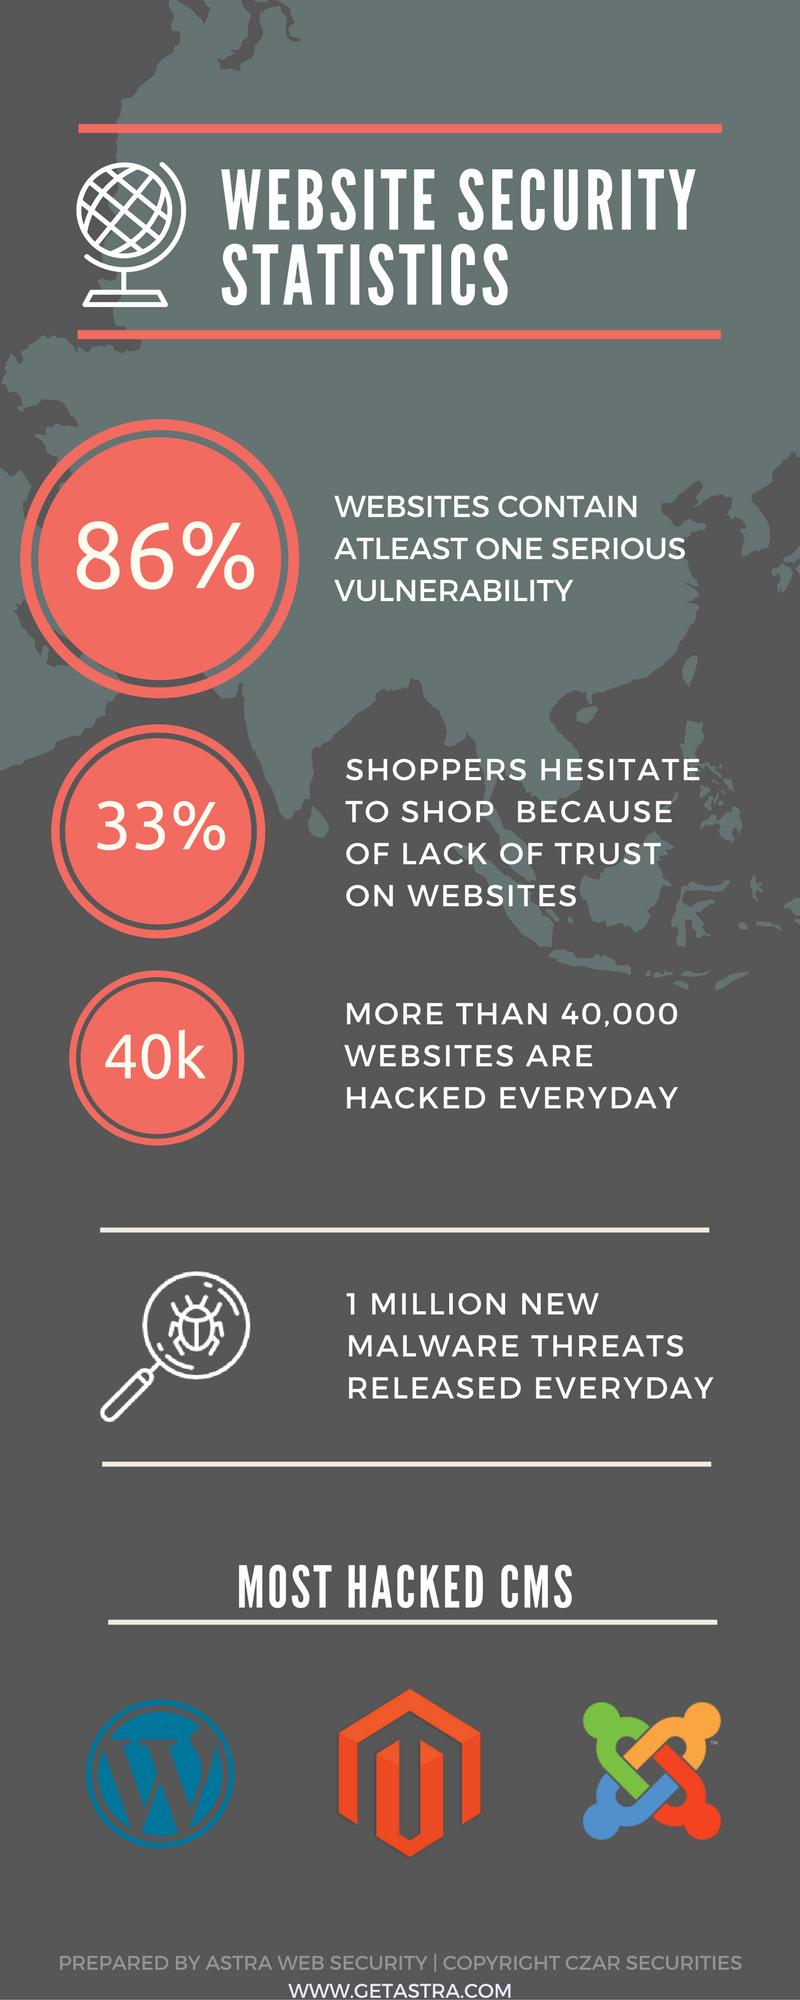 Magento Security Malware Sqli Xss Creditcard Hack